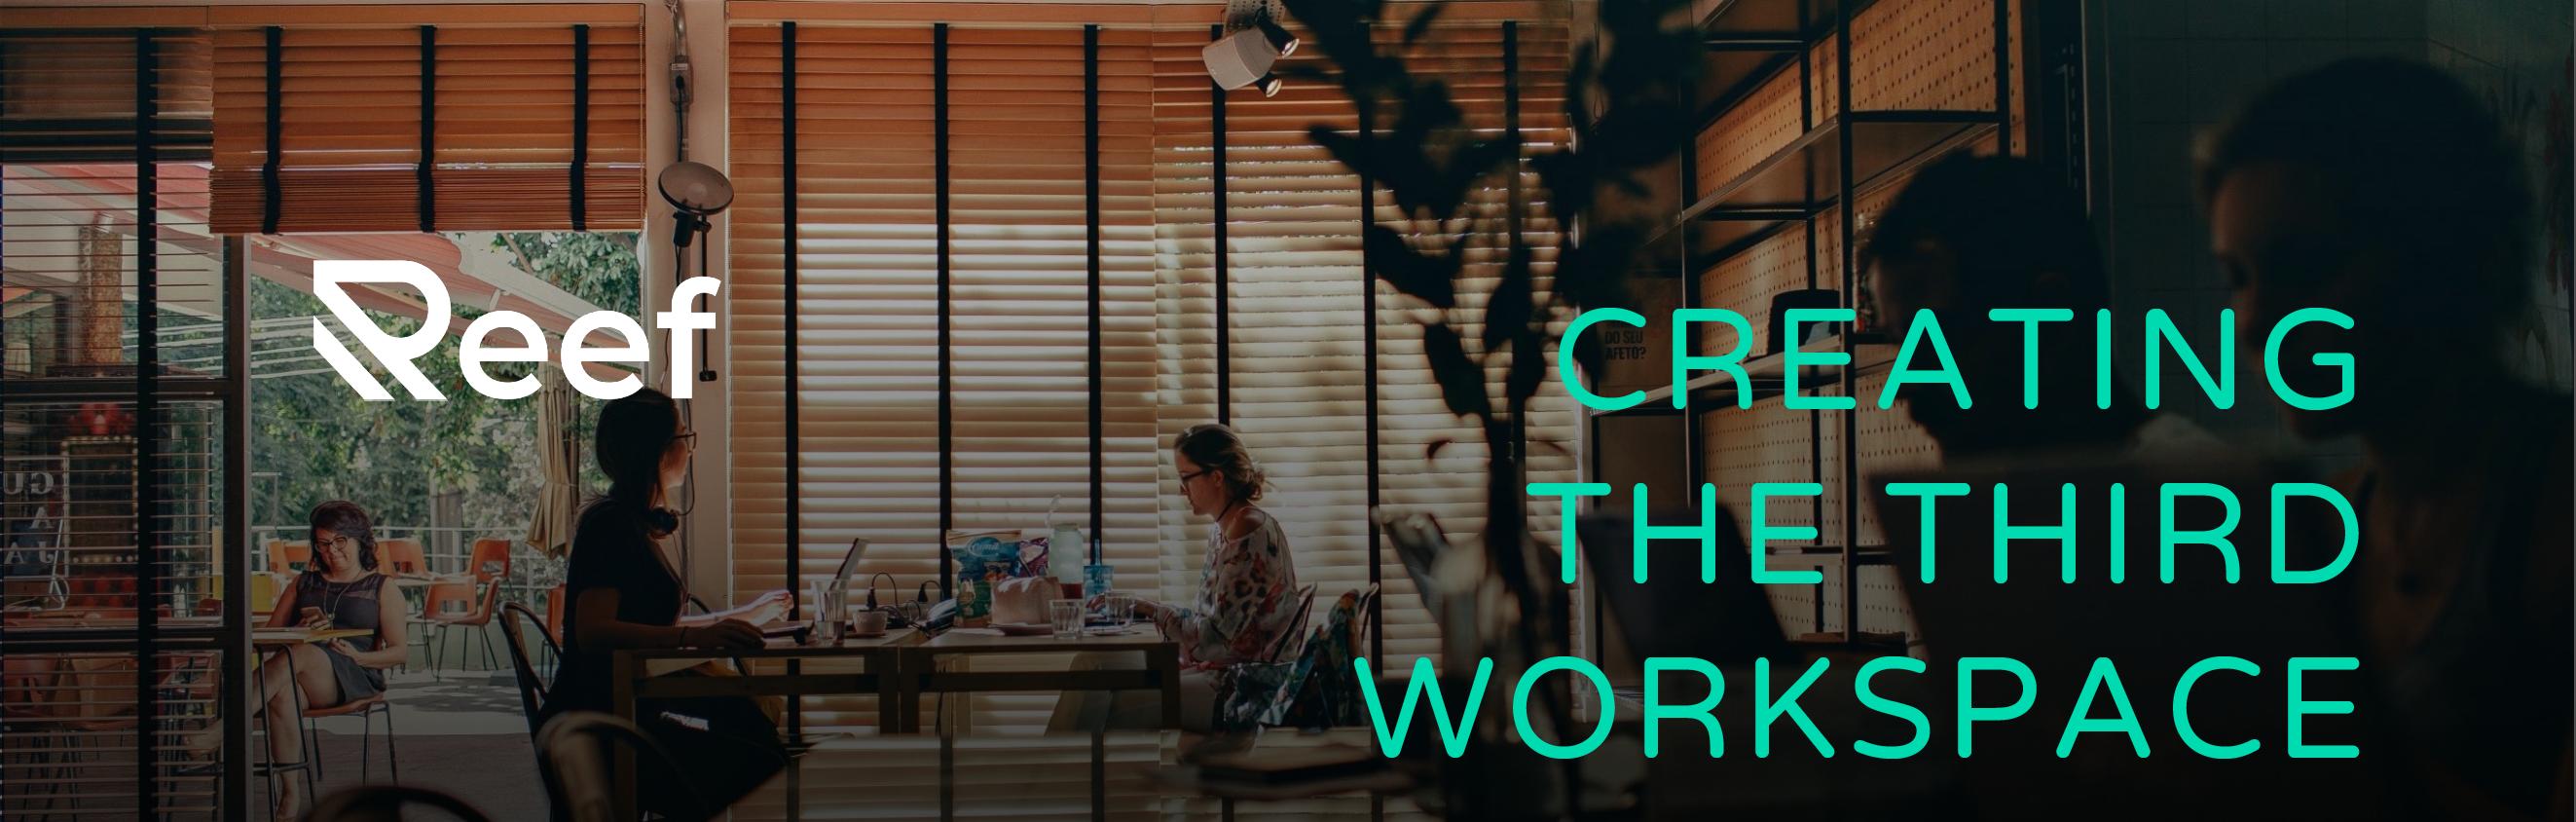 Reef-Creating the Third Workspace